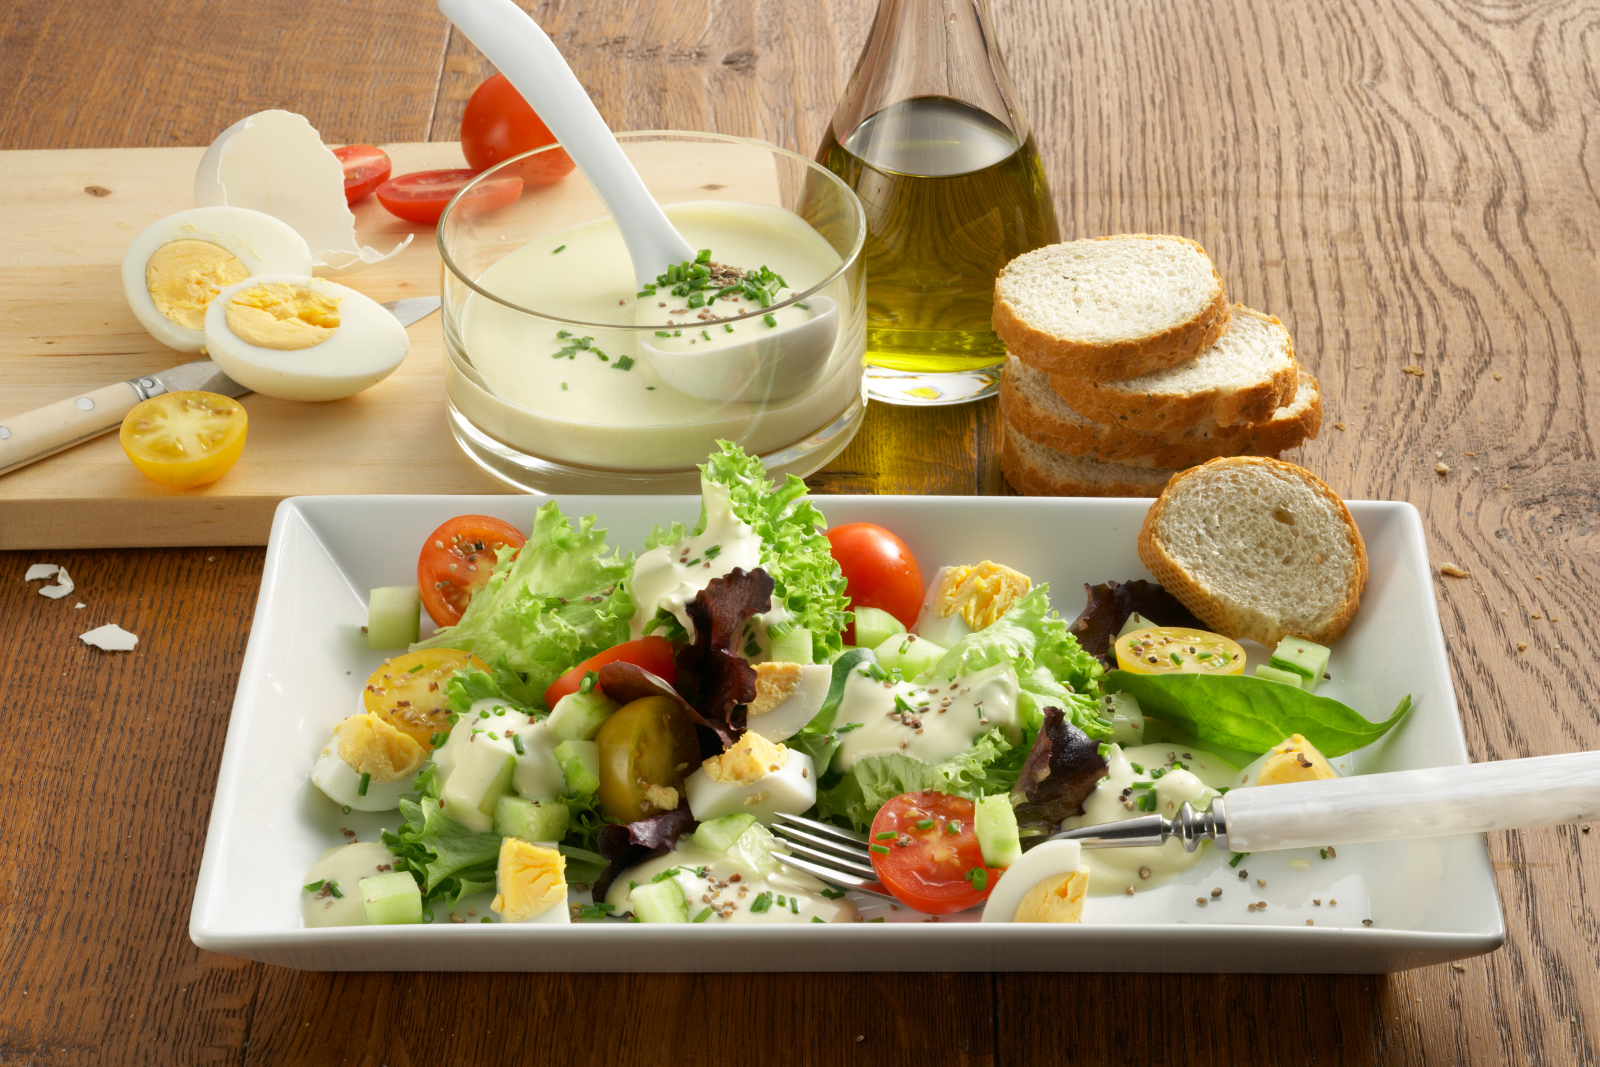 Bunter Salat mit Käse-Dressing - leckere Rezeptidee